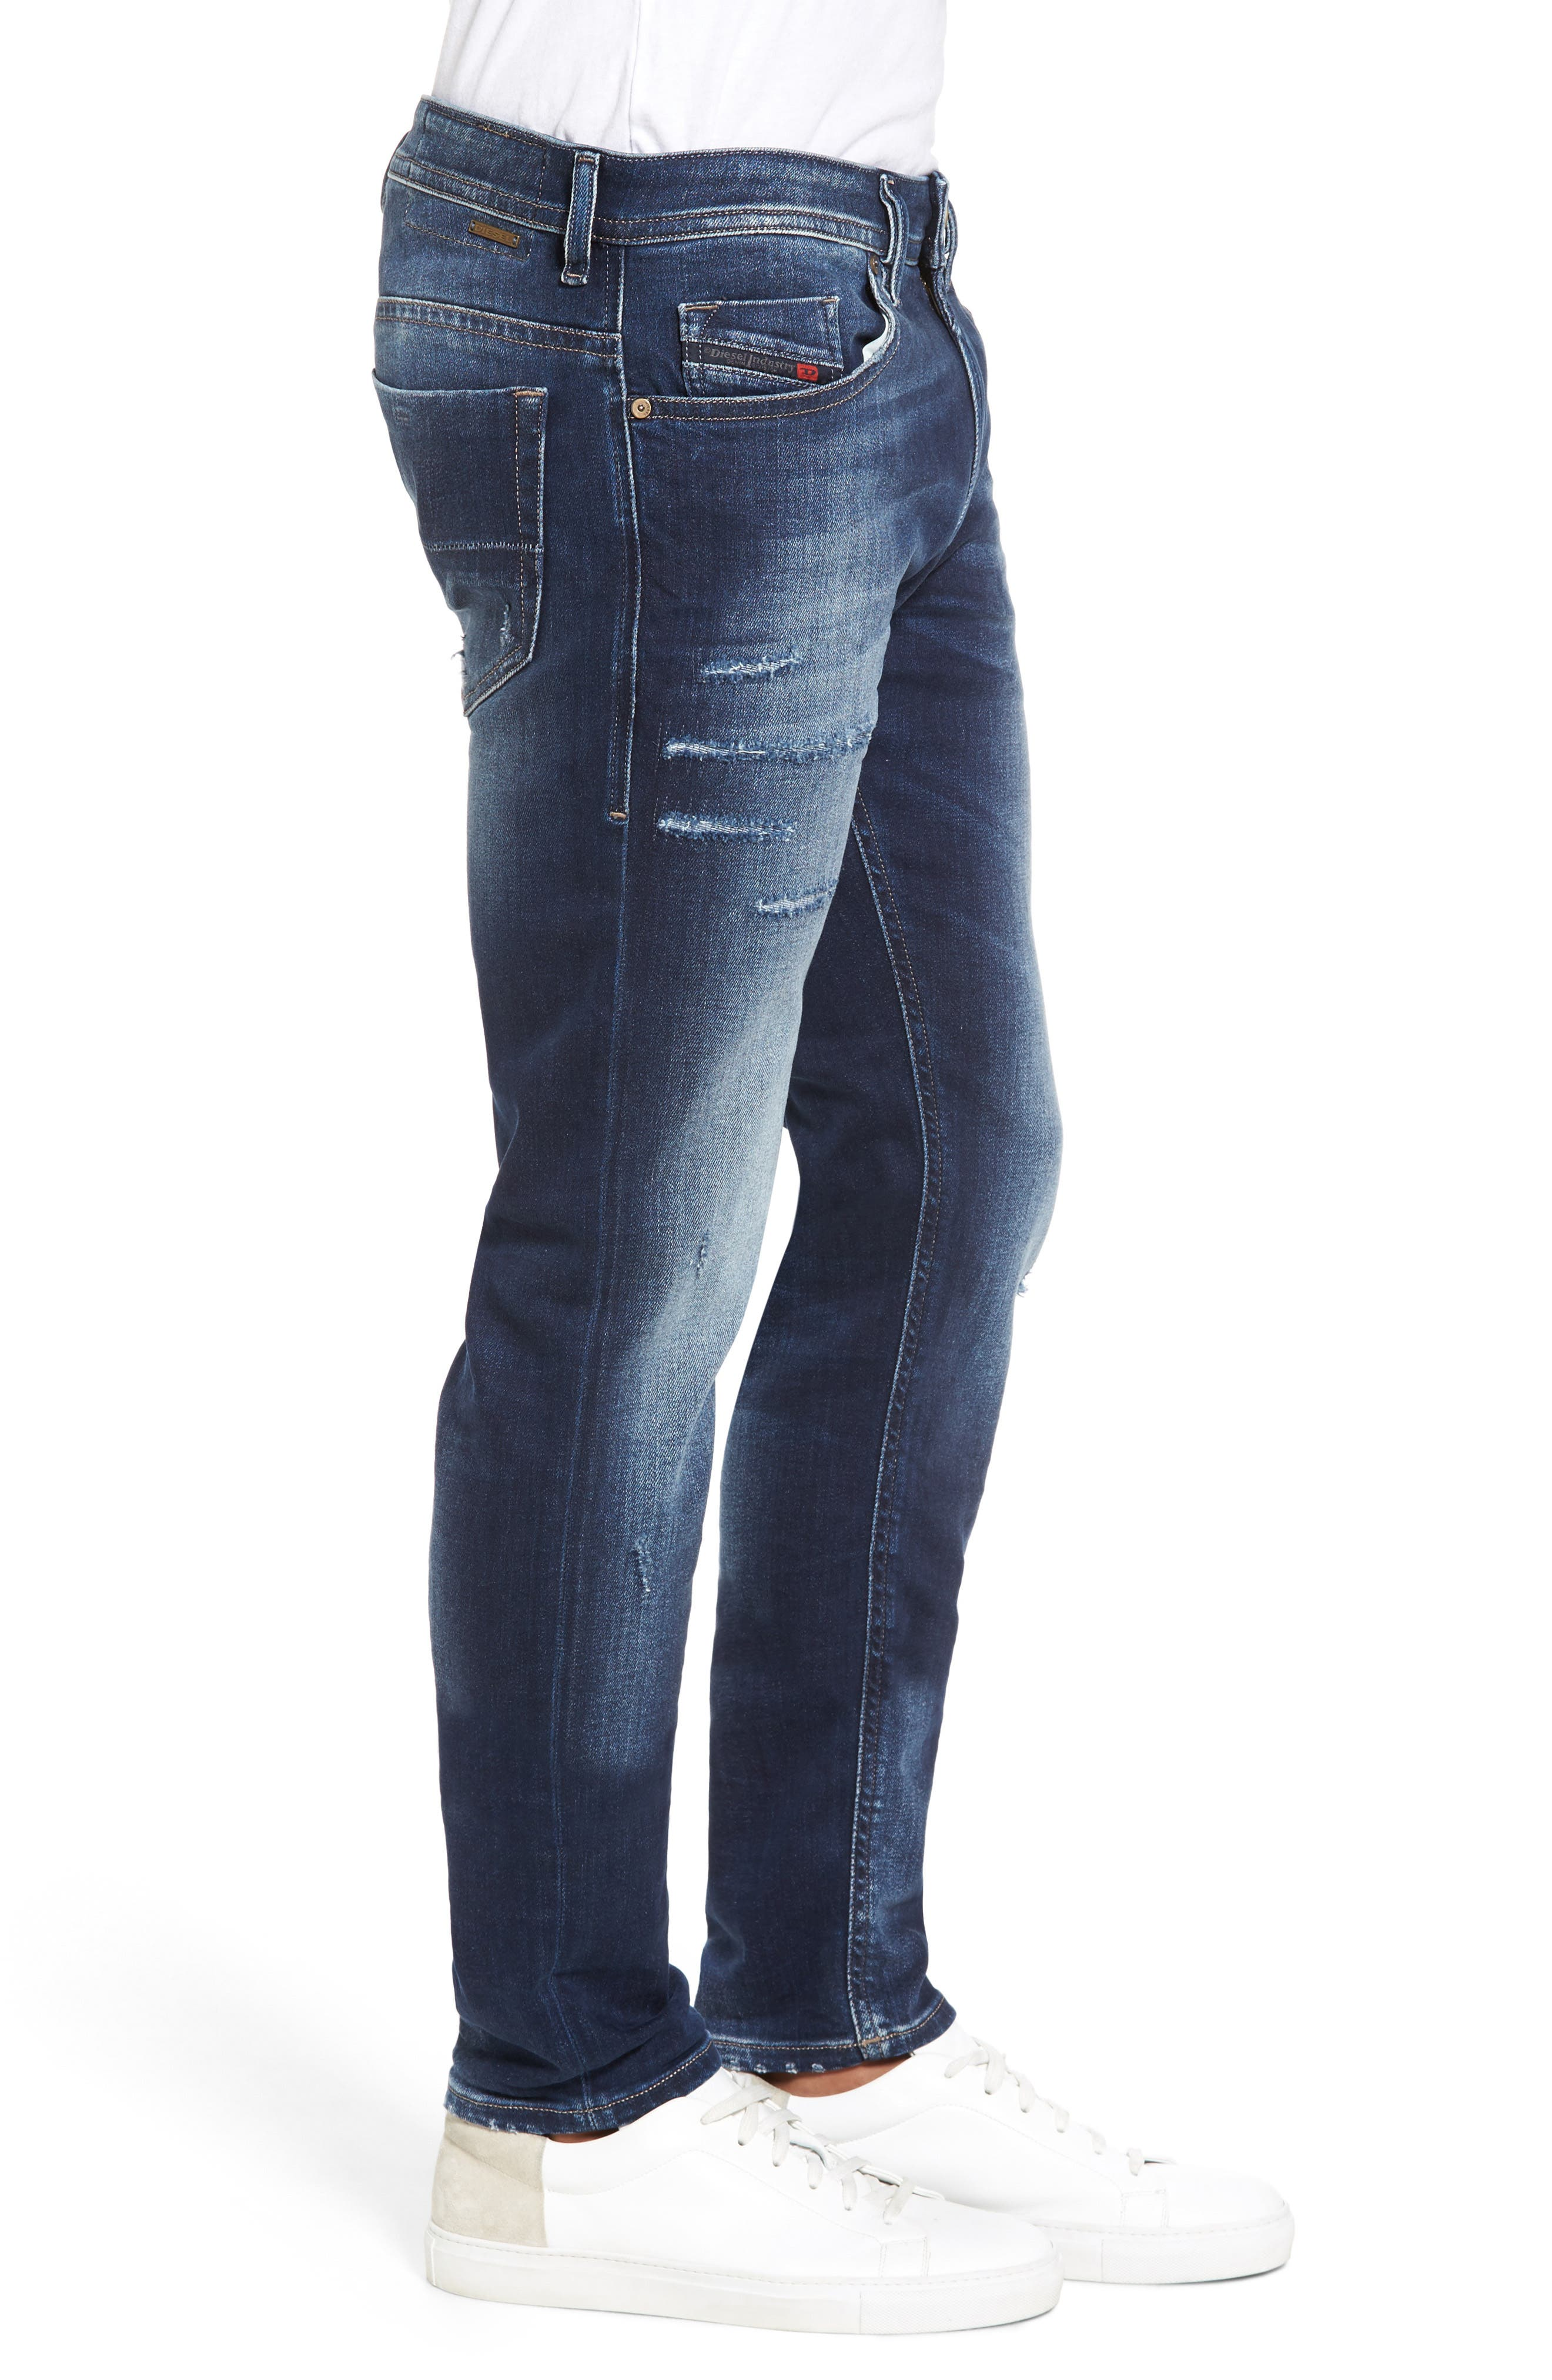 Thommer Slim Fit Jeans,                             Alternate thumbnail 3, color,